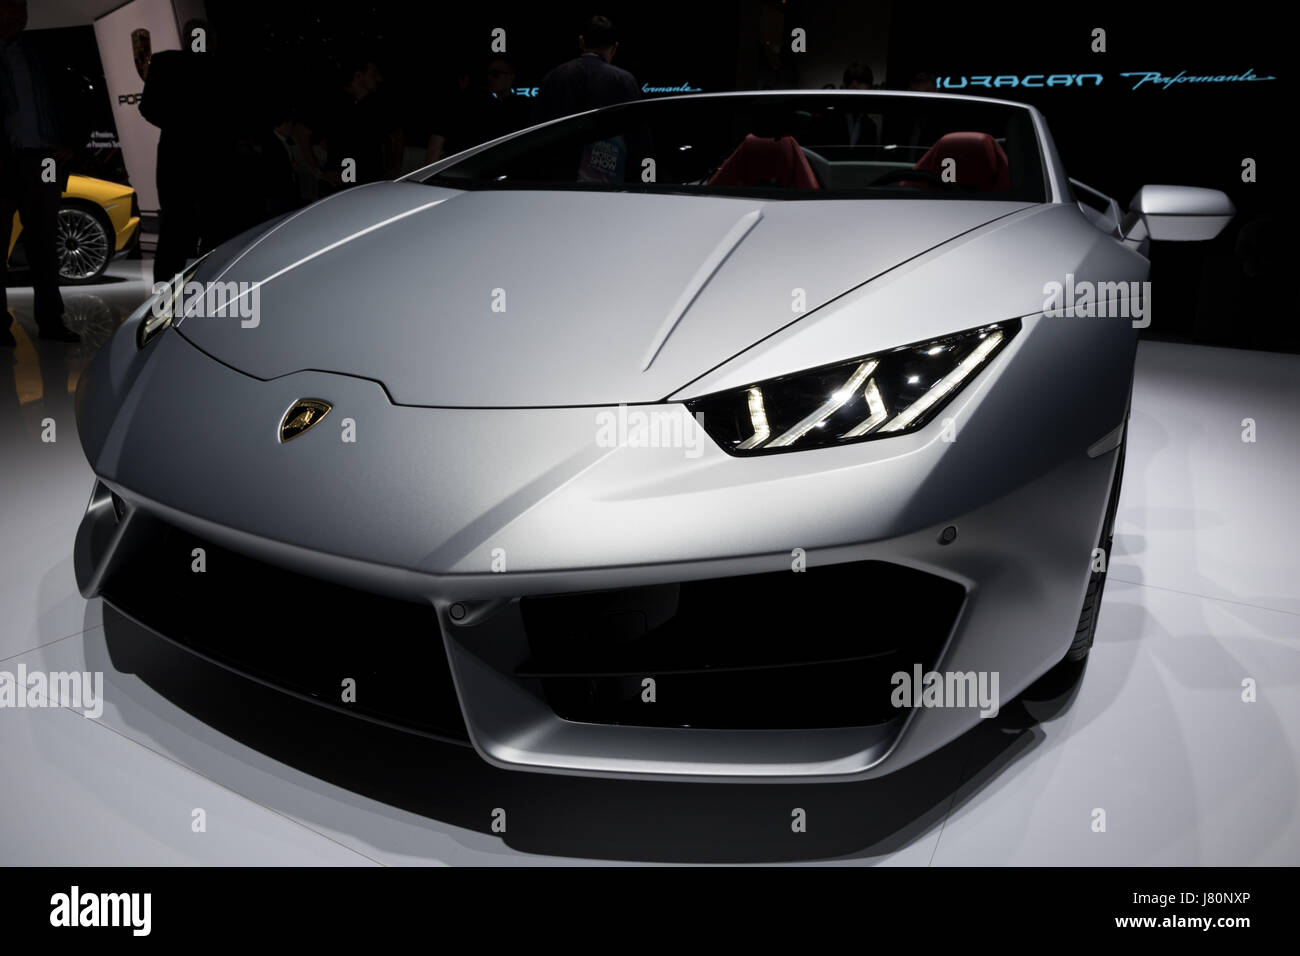 GENEVA, SWITZERLAND - MARCH 7, 2017: Lamborghini Huracan RWD Spyder sports car presented at the 87th Geneva International - Stock Image